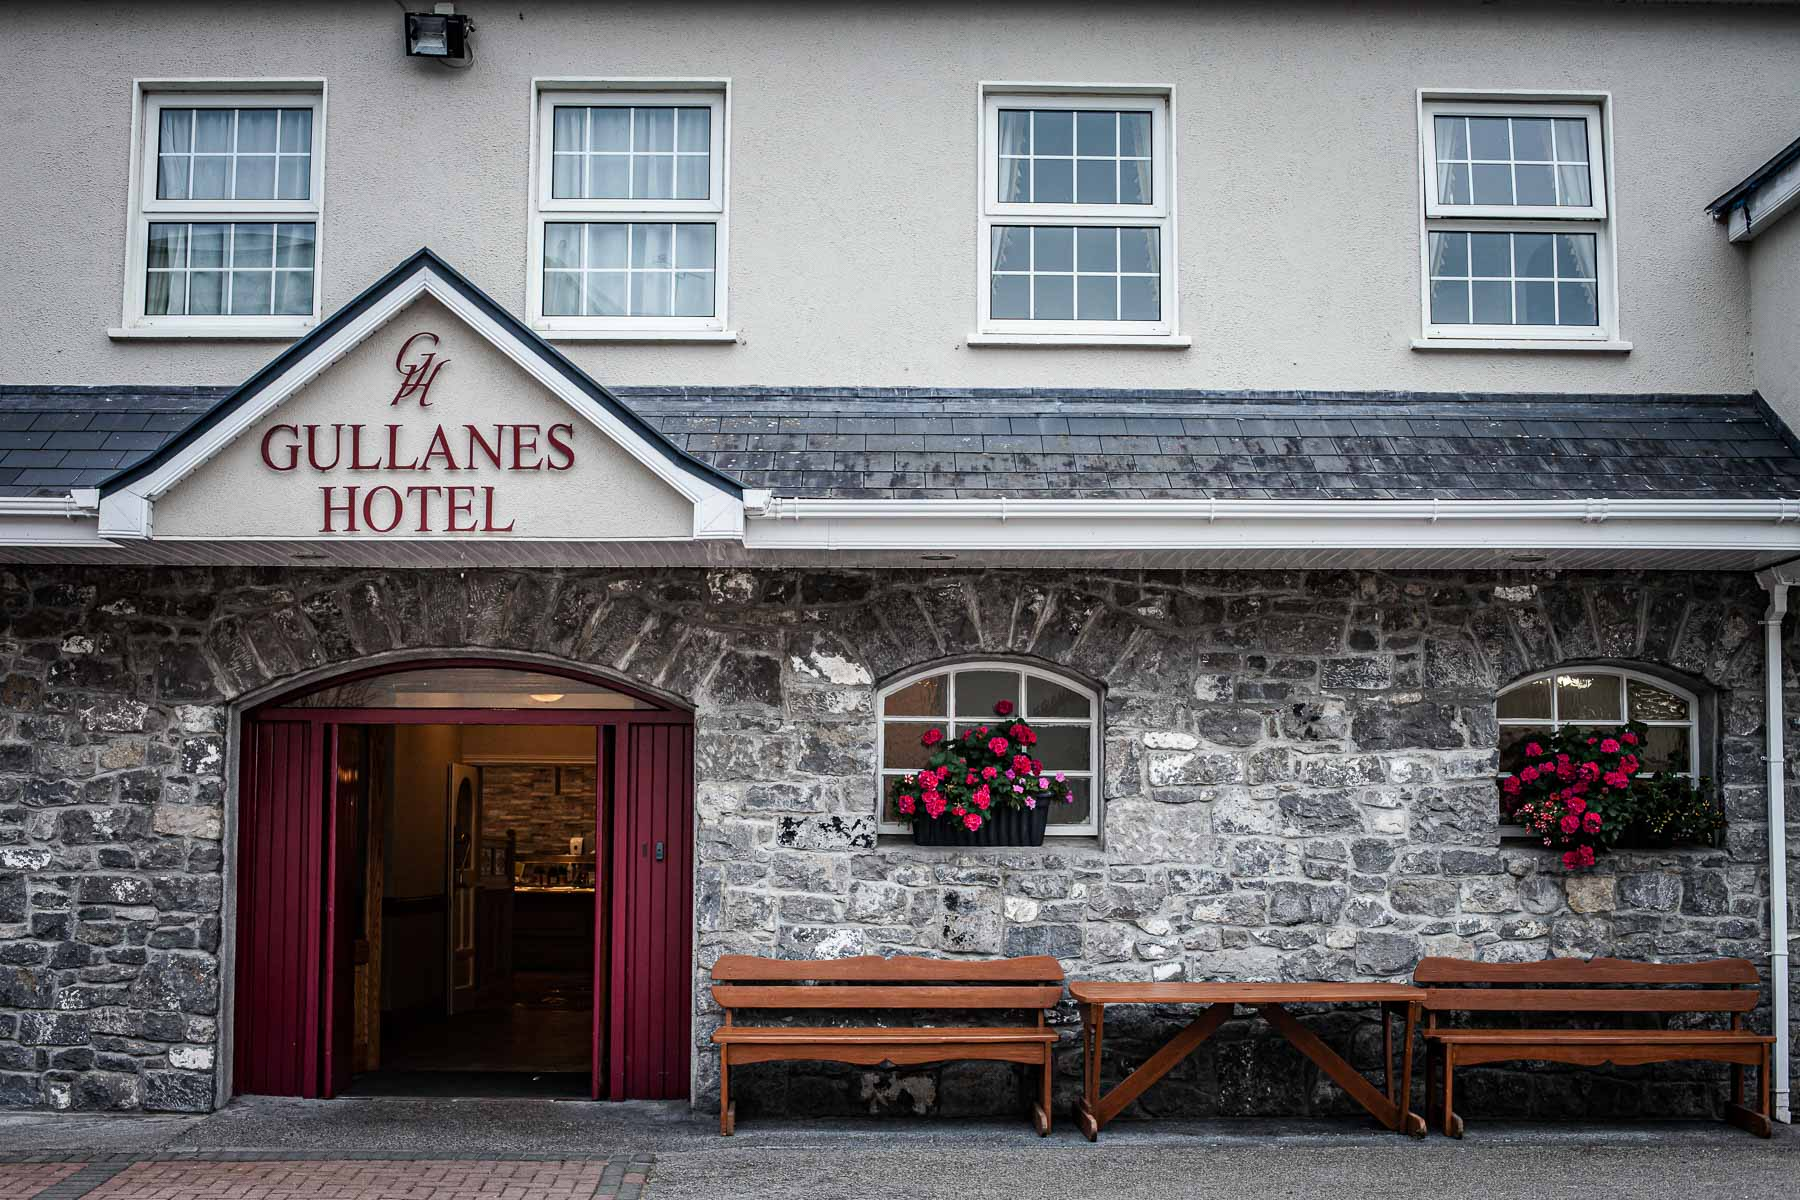 Gullanes Hotel